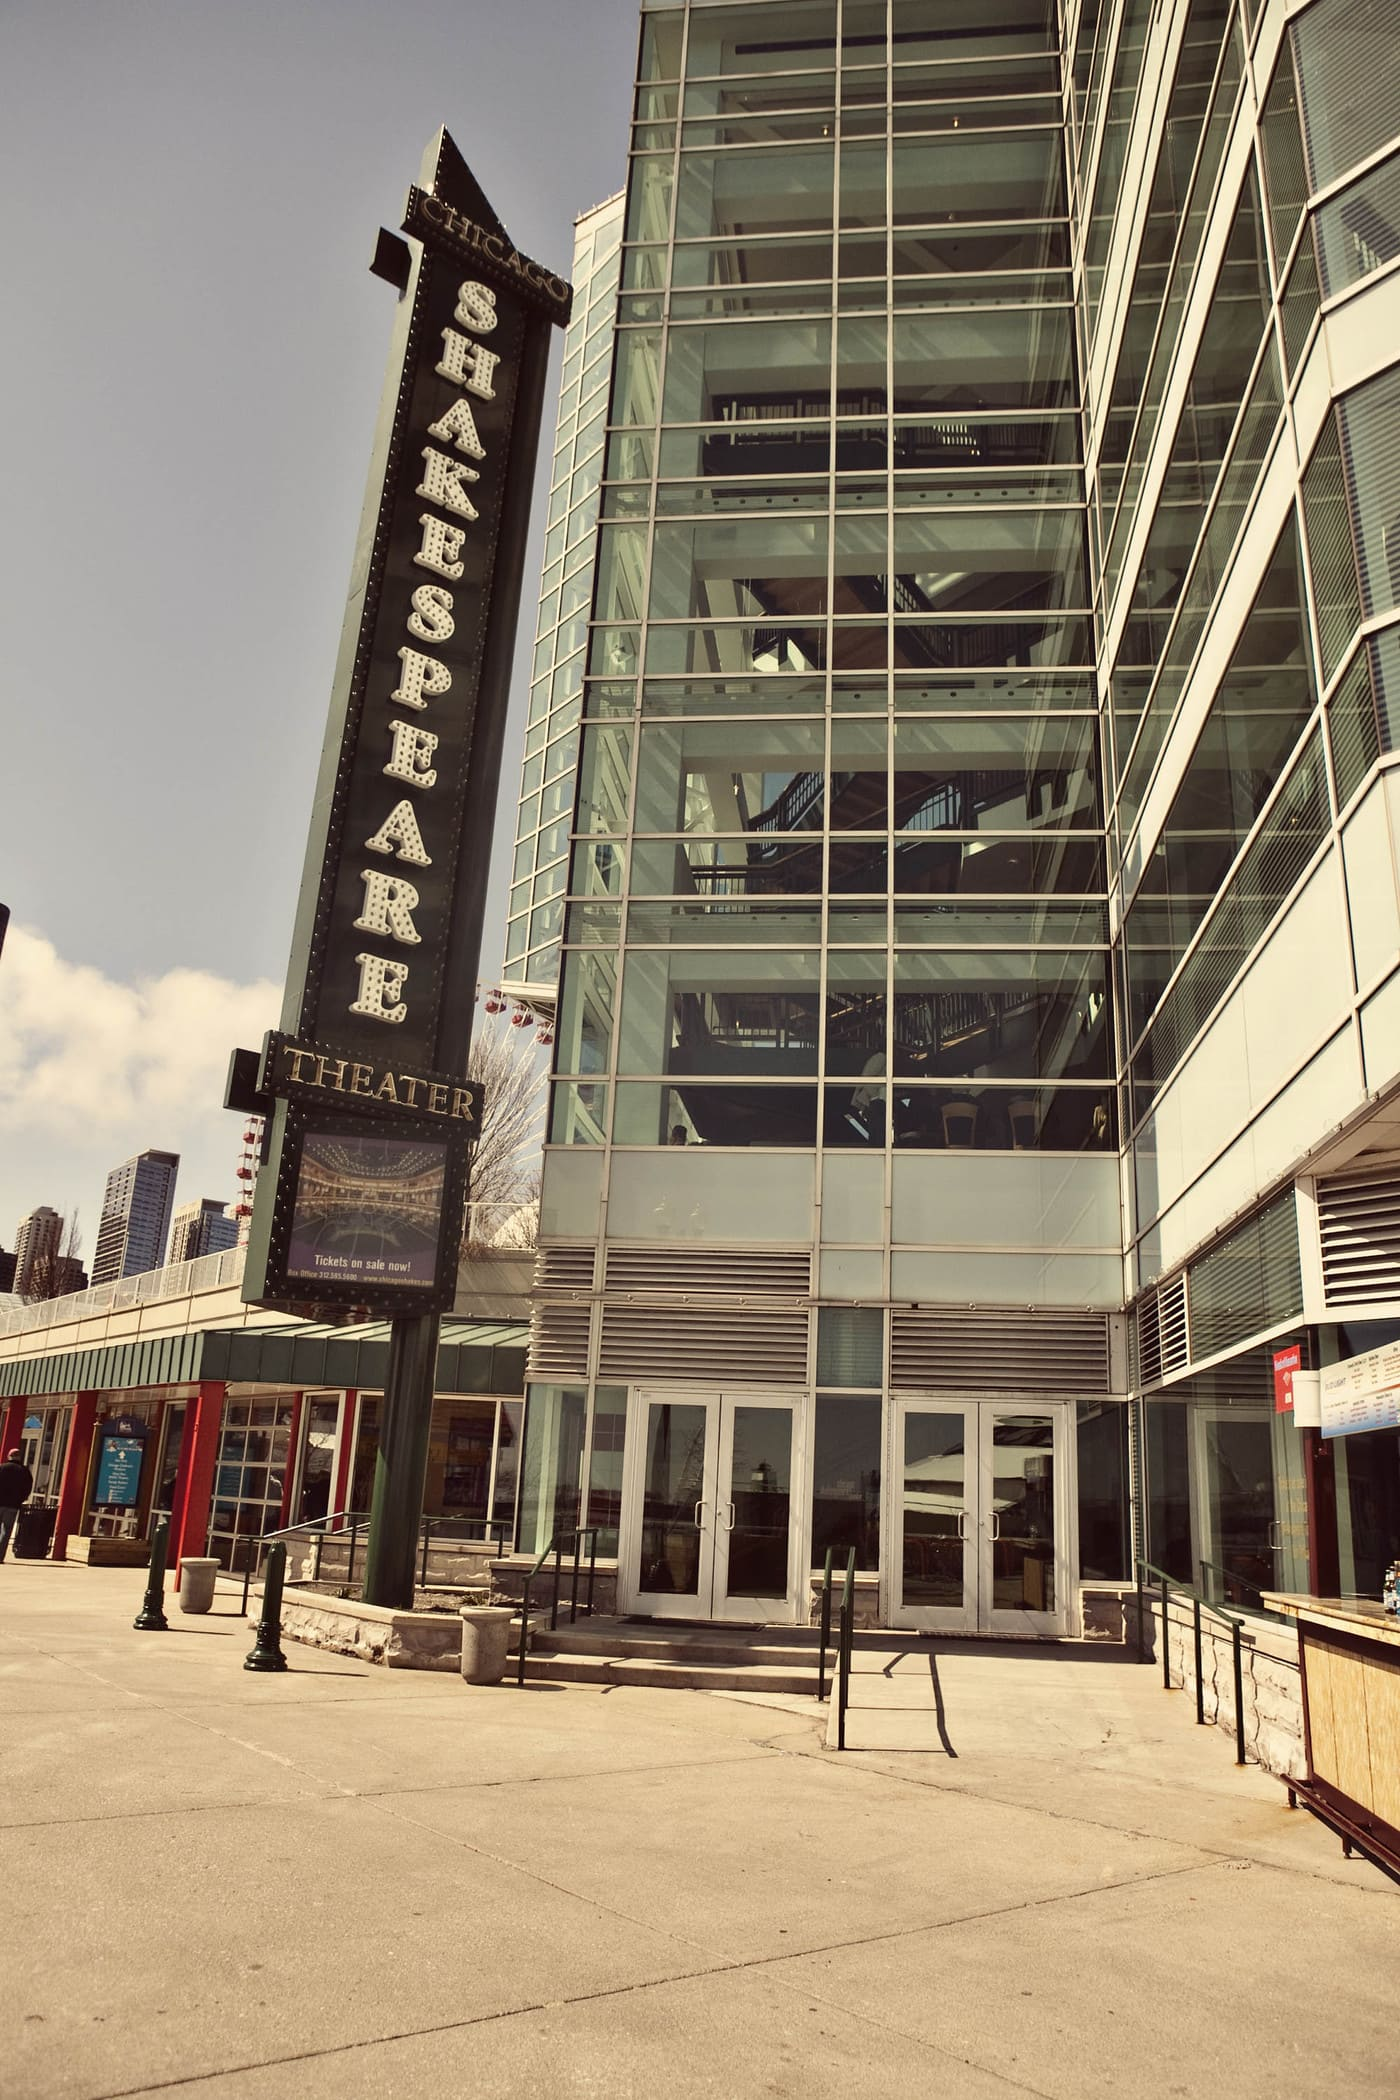 Chiago Shakespeare Theatre at Navy Pier